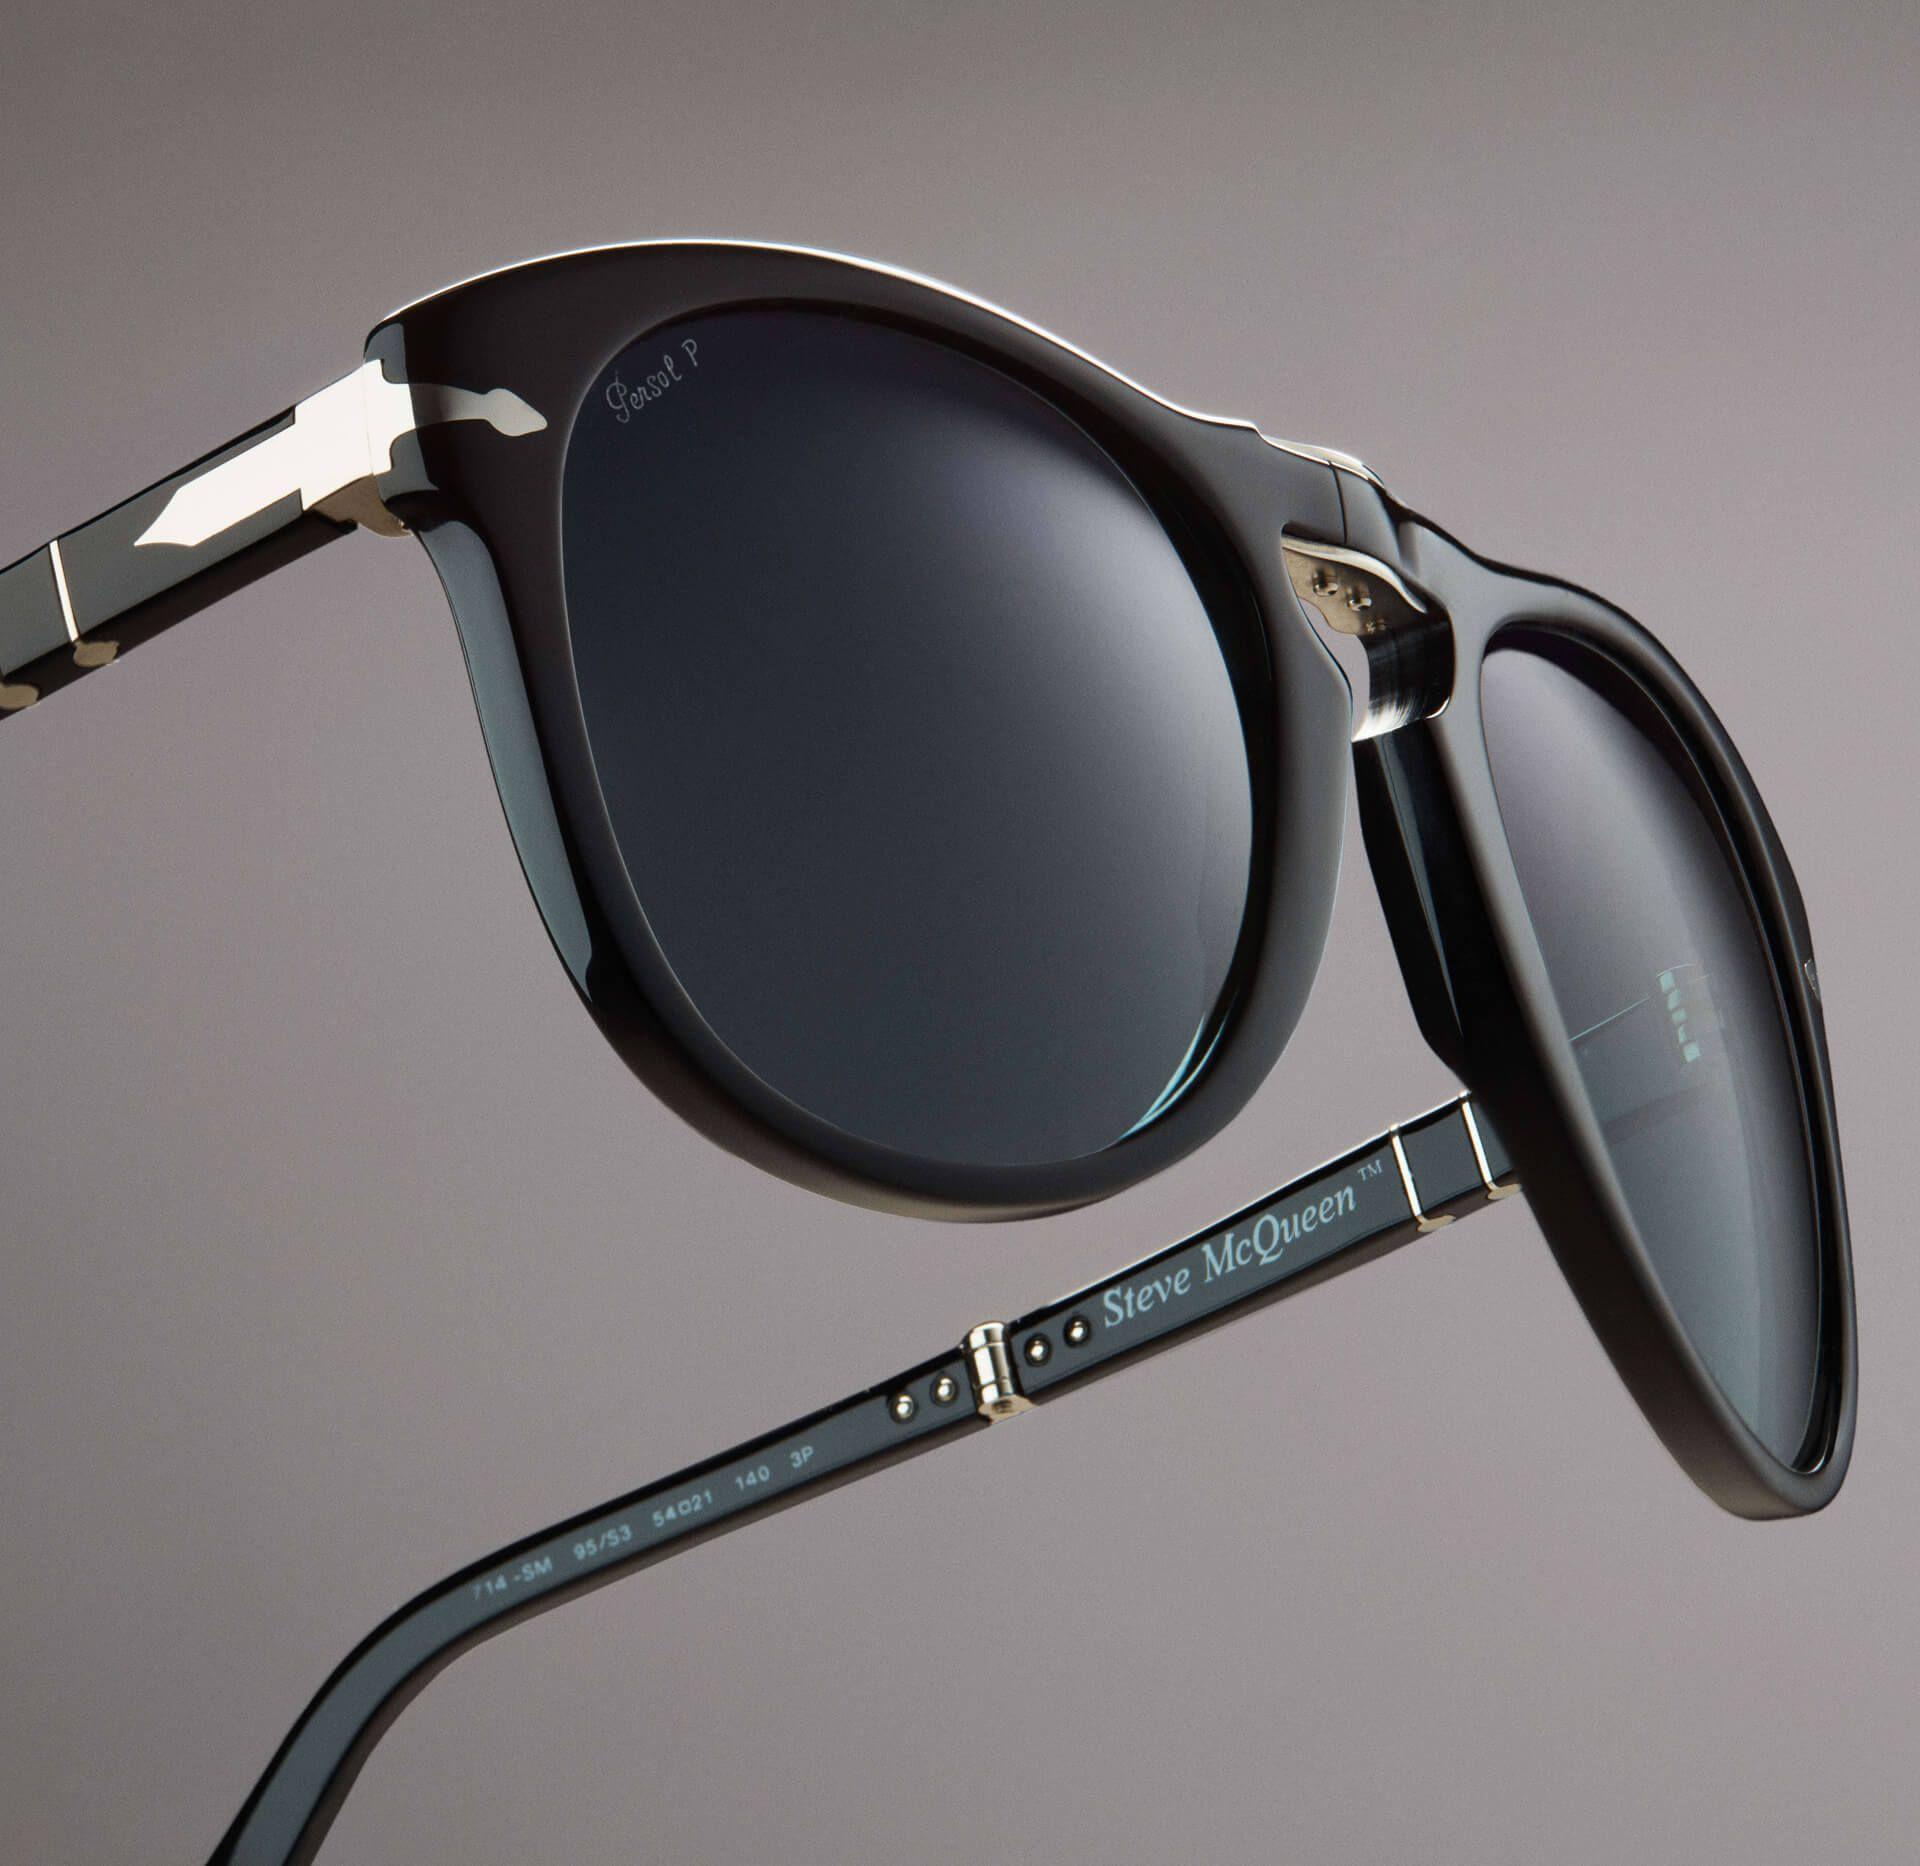 Cyber Monday sunglasses image